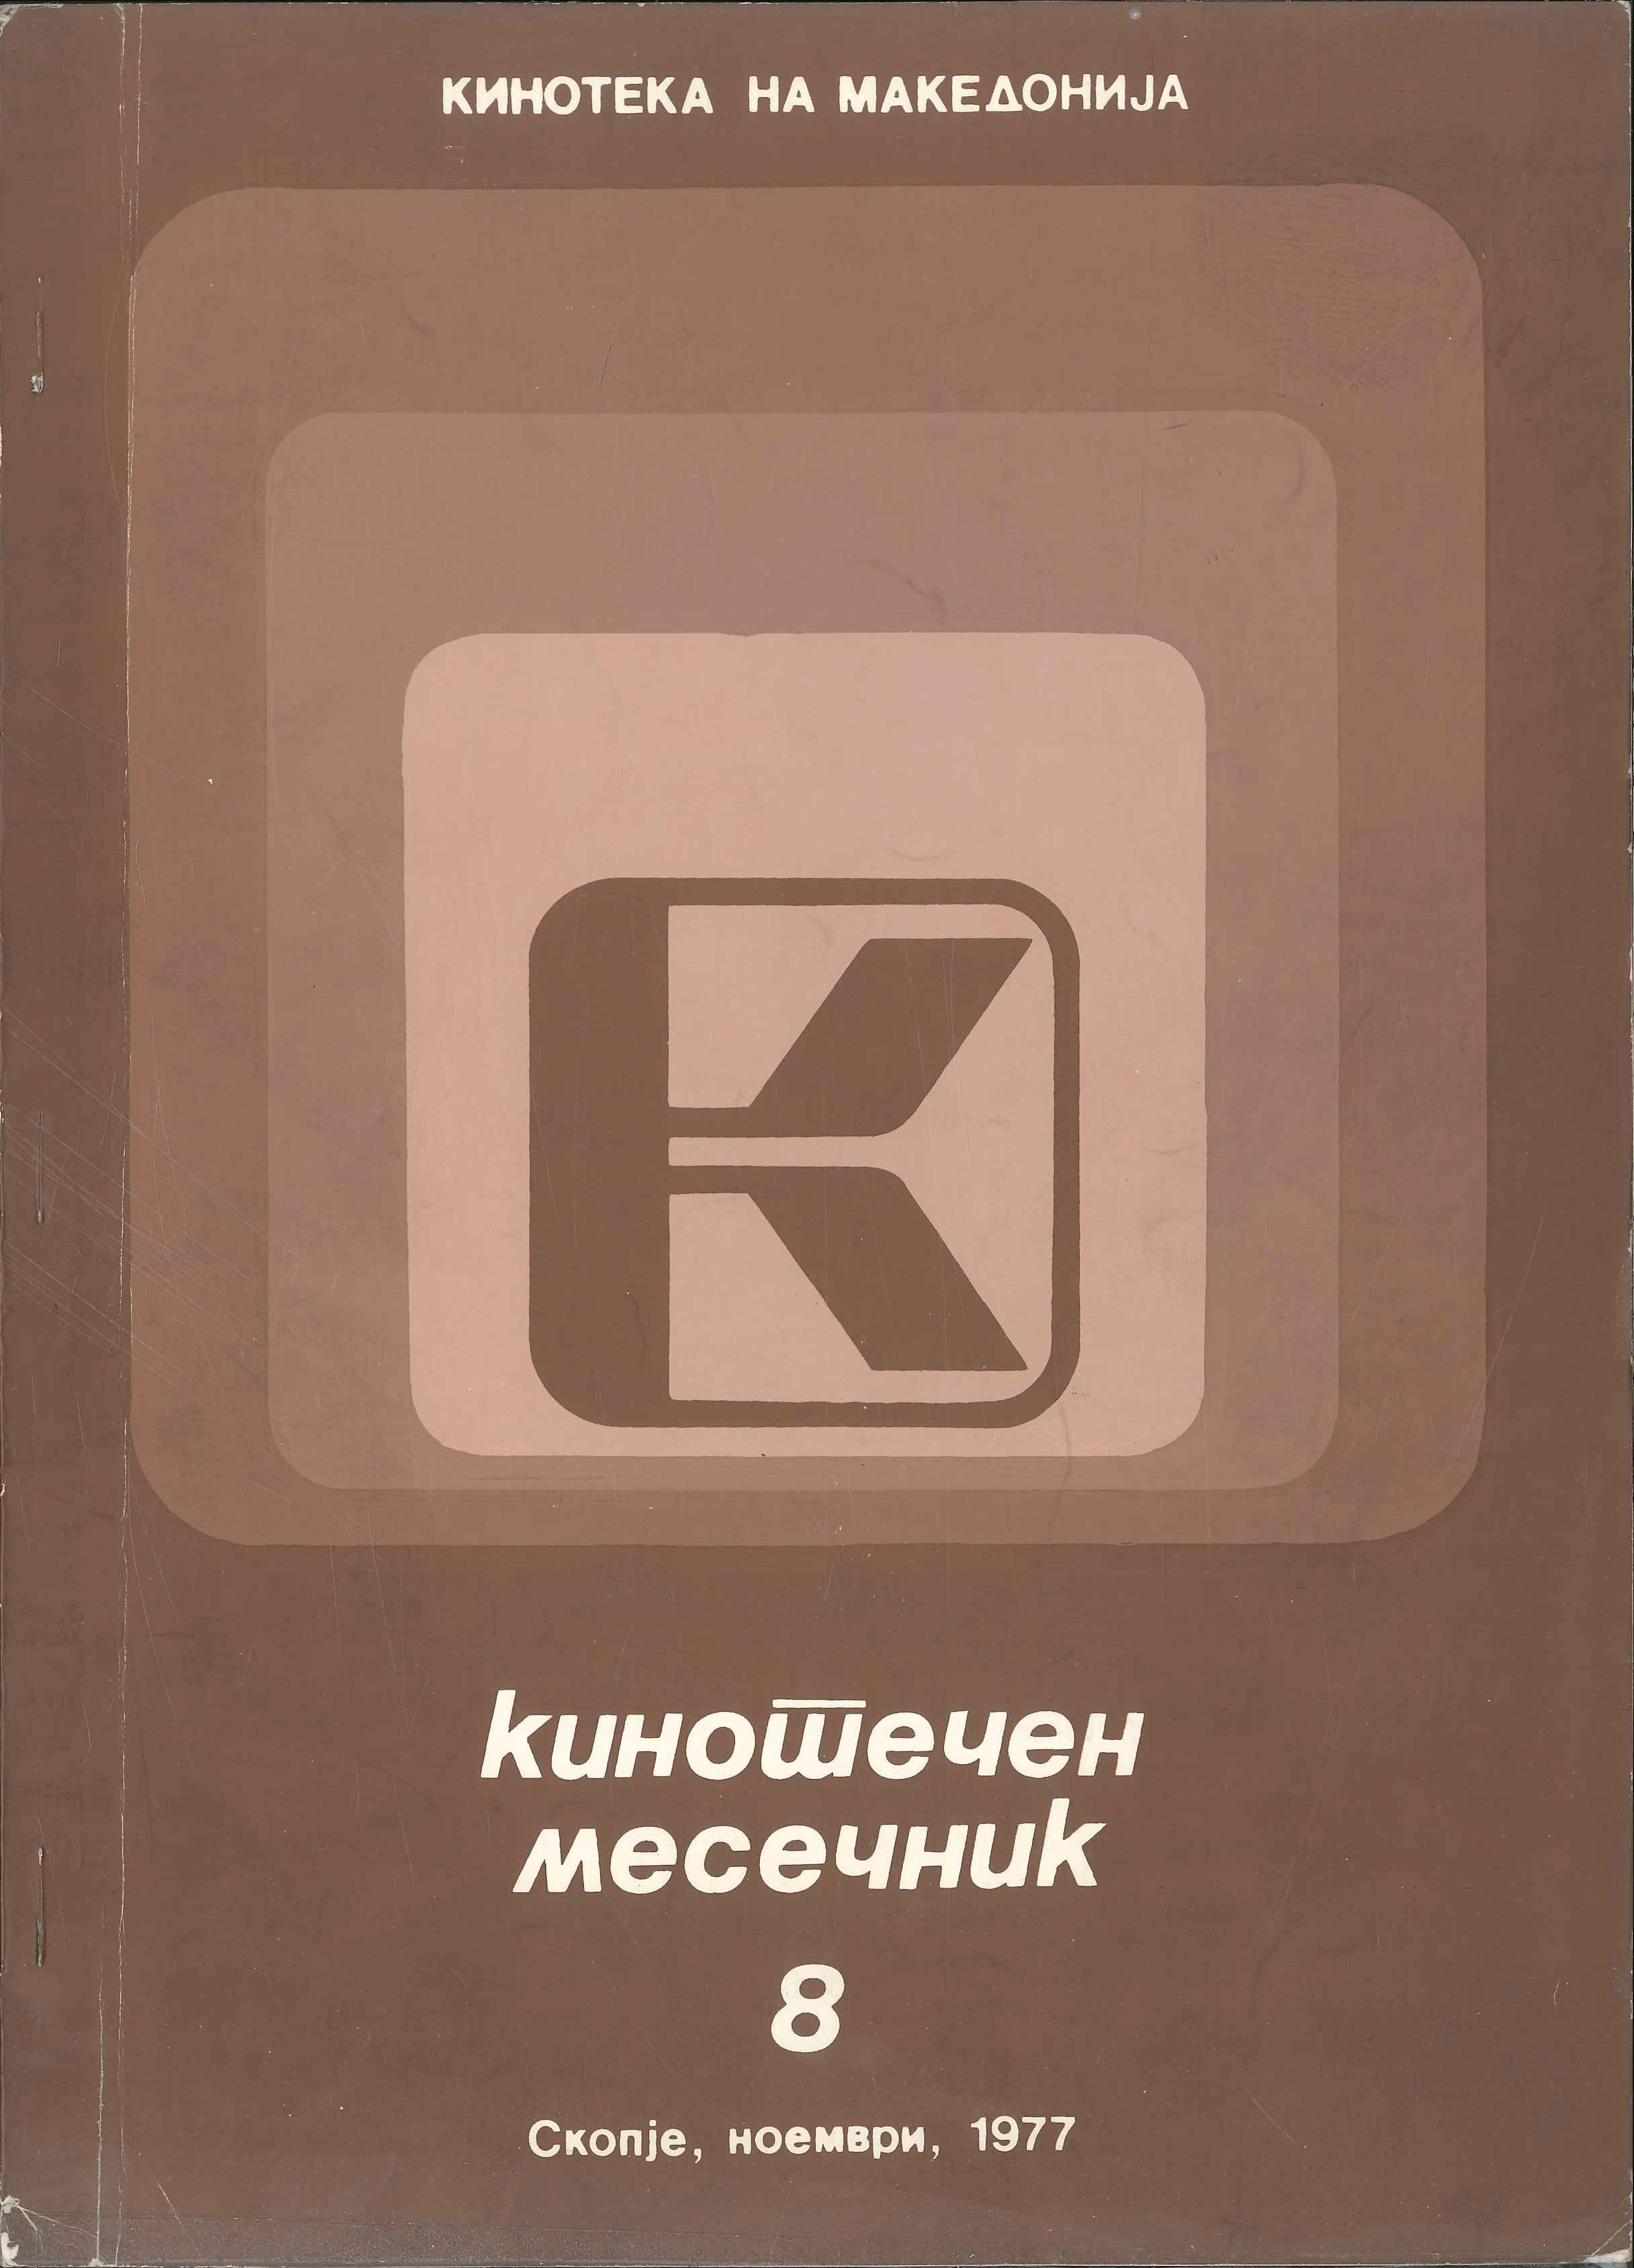 Кинотечен месечник бр. 8